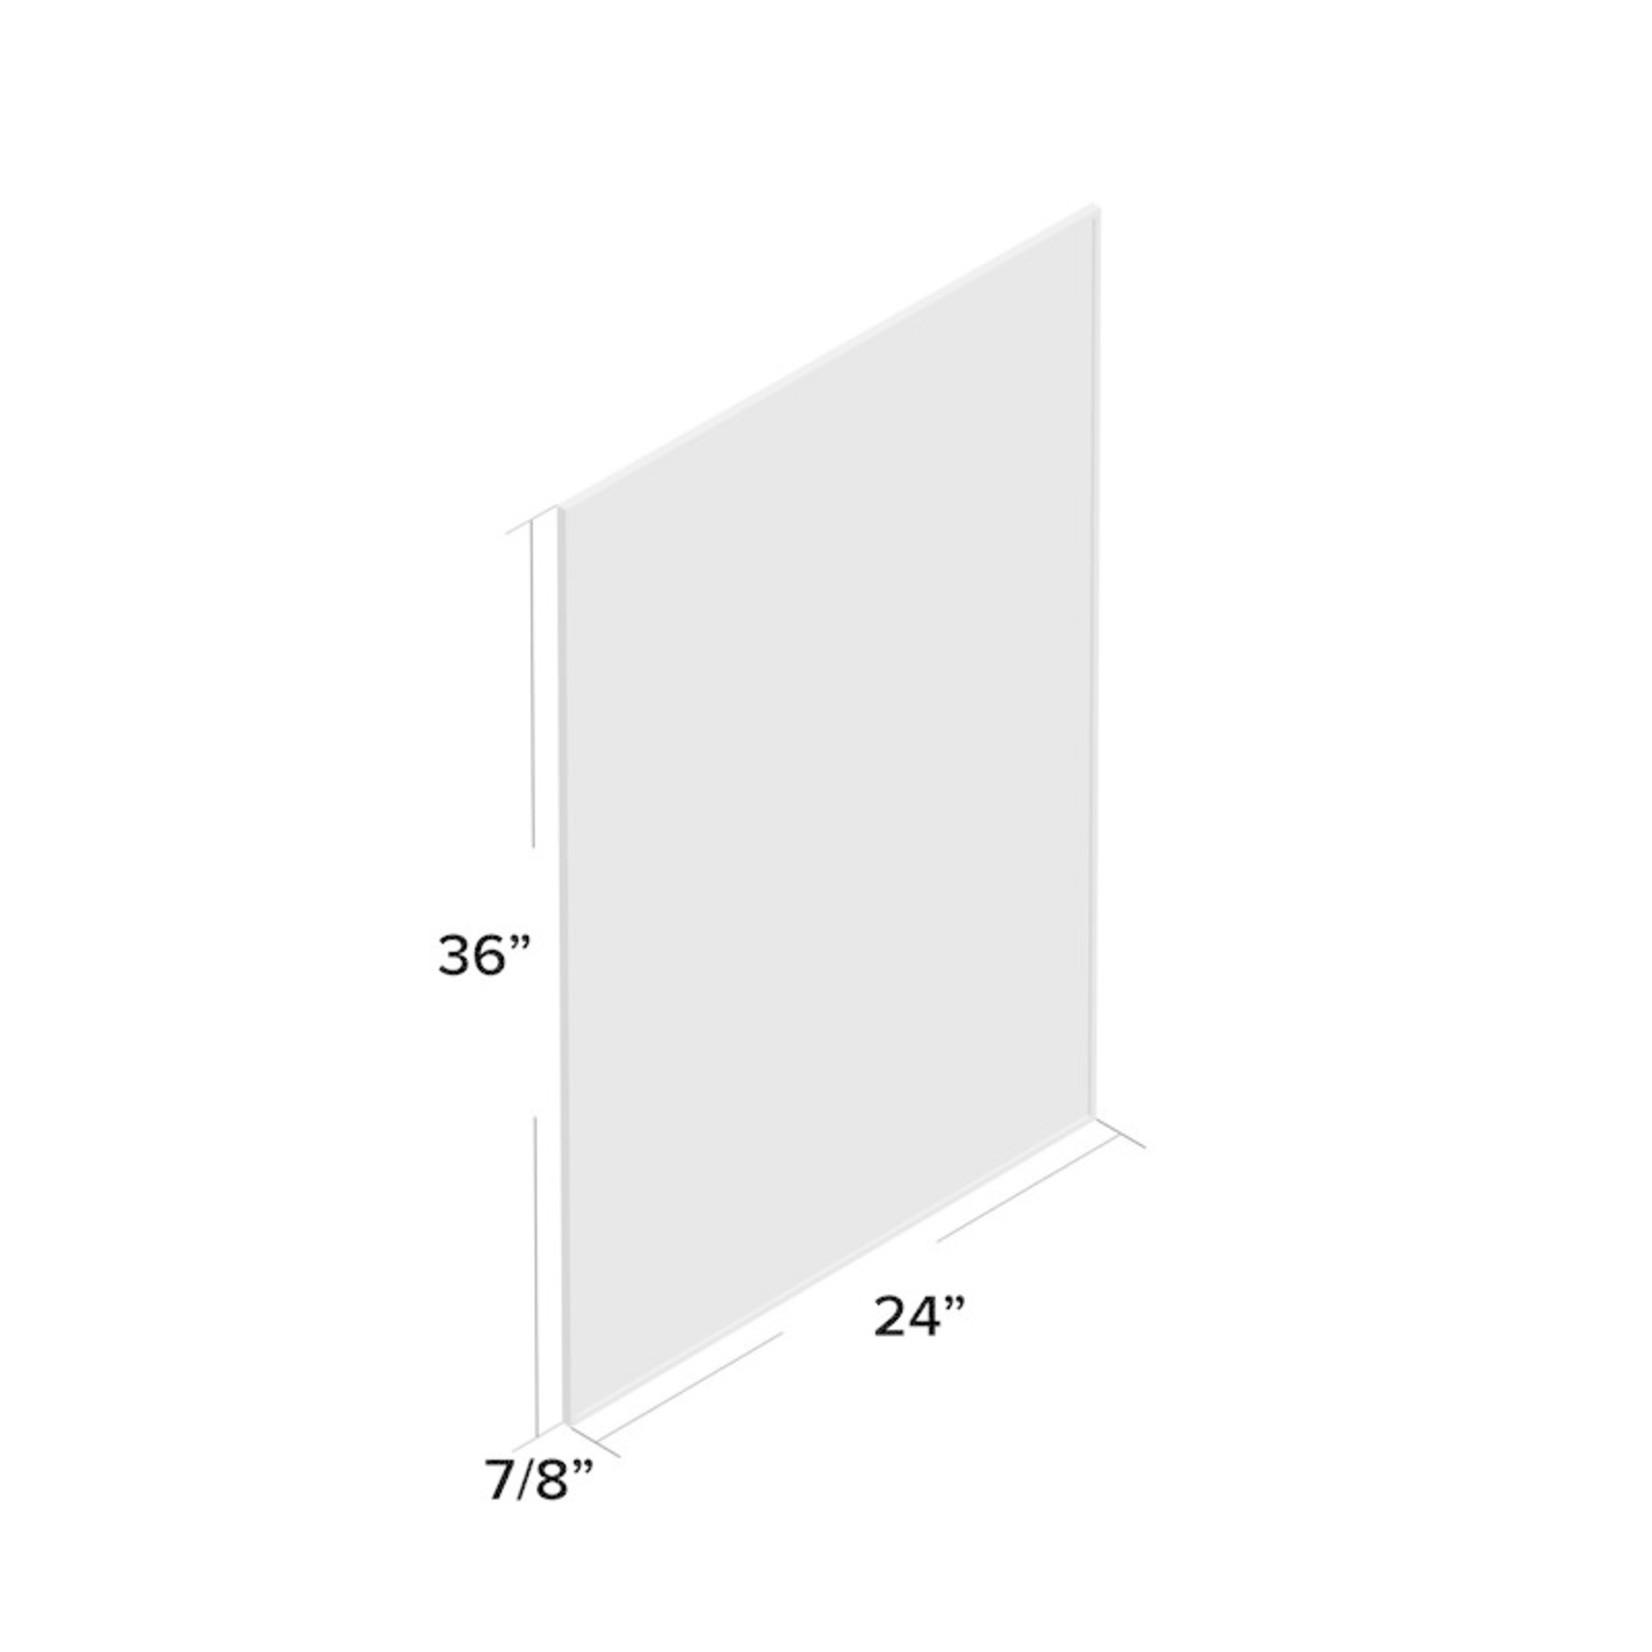 "*Newtown Modern & Contemporary Bathroom / Vanity Mirror - Black - 36"" x 24"""